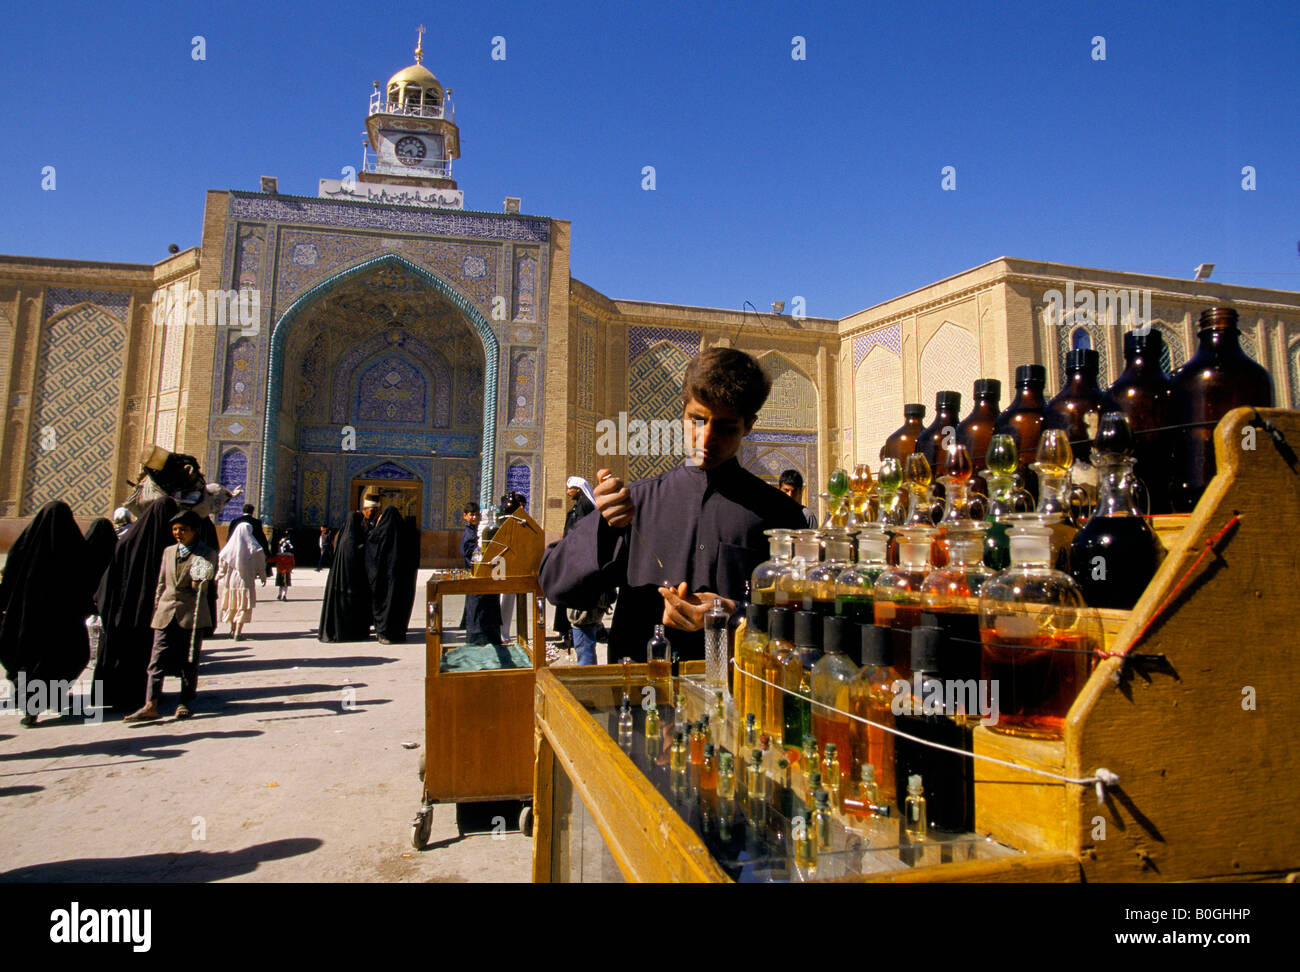 Maula Ali Shrine Wallpaper: Najaf Stock Photos & Najaf Stock Images